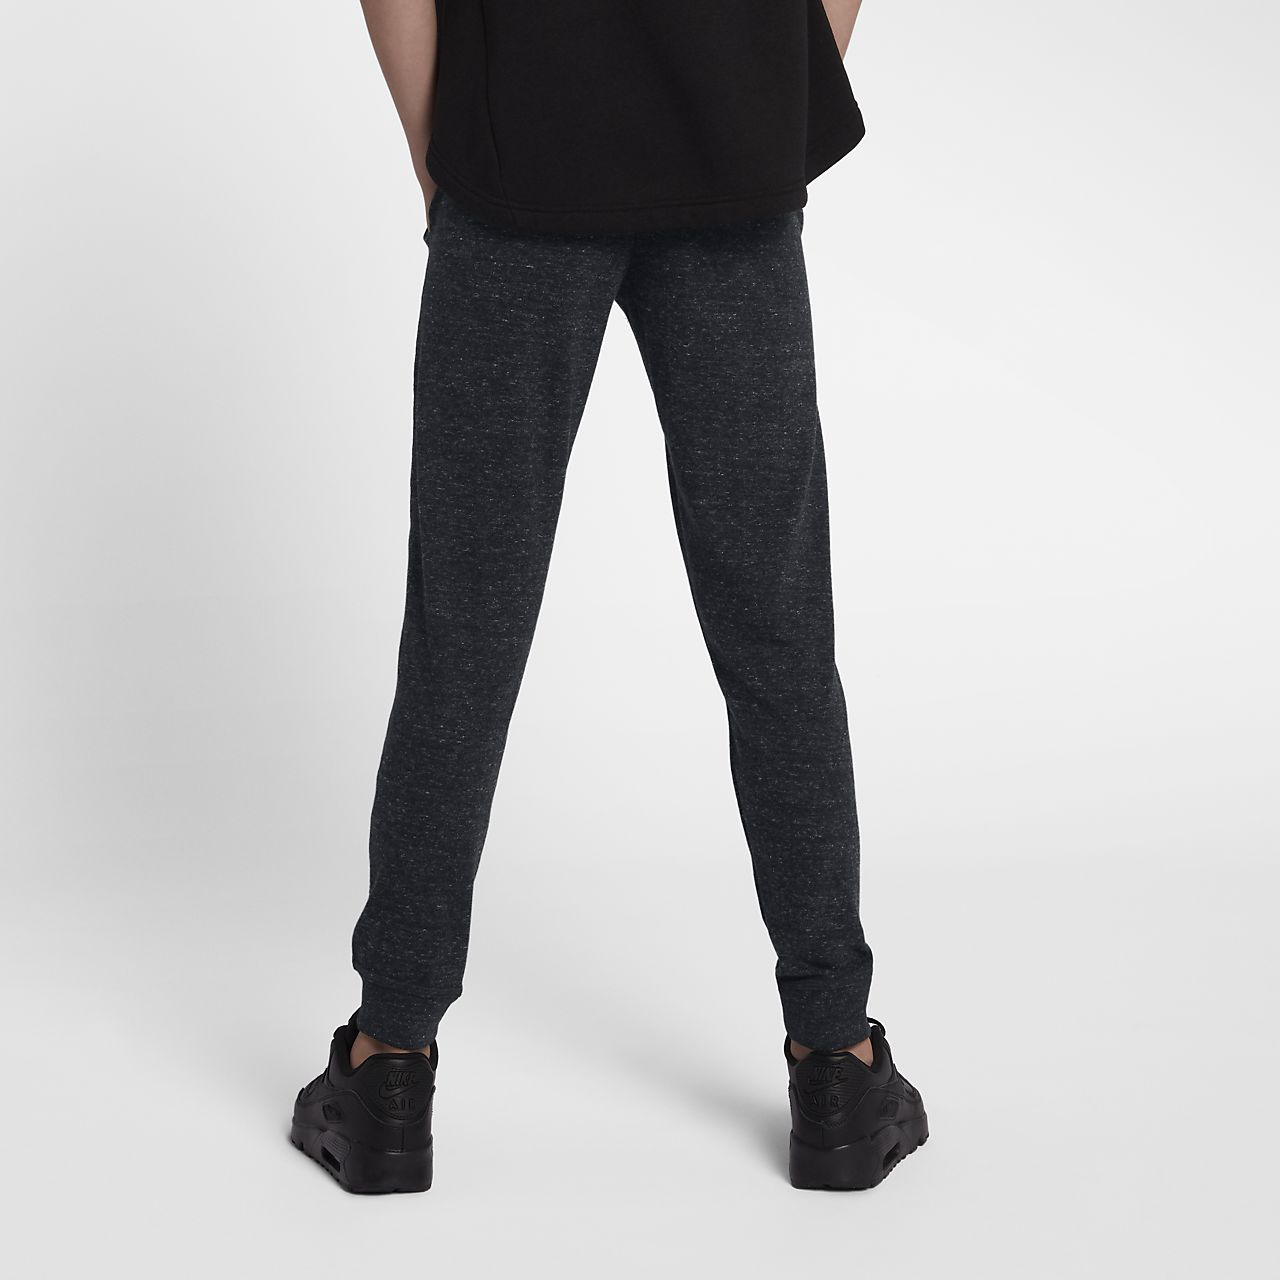 cdf4b6ae Nike Sportswear Vintage Older Kids' (Girls') Trousers. Nike.com CA